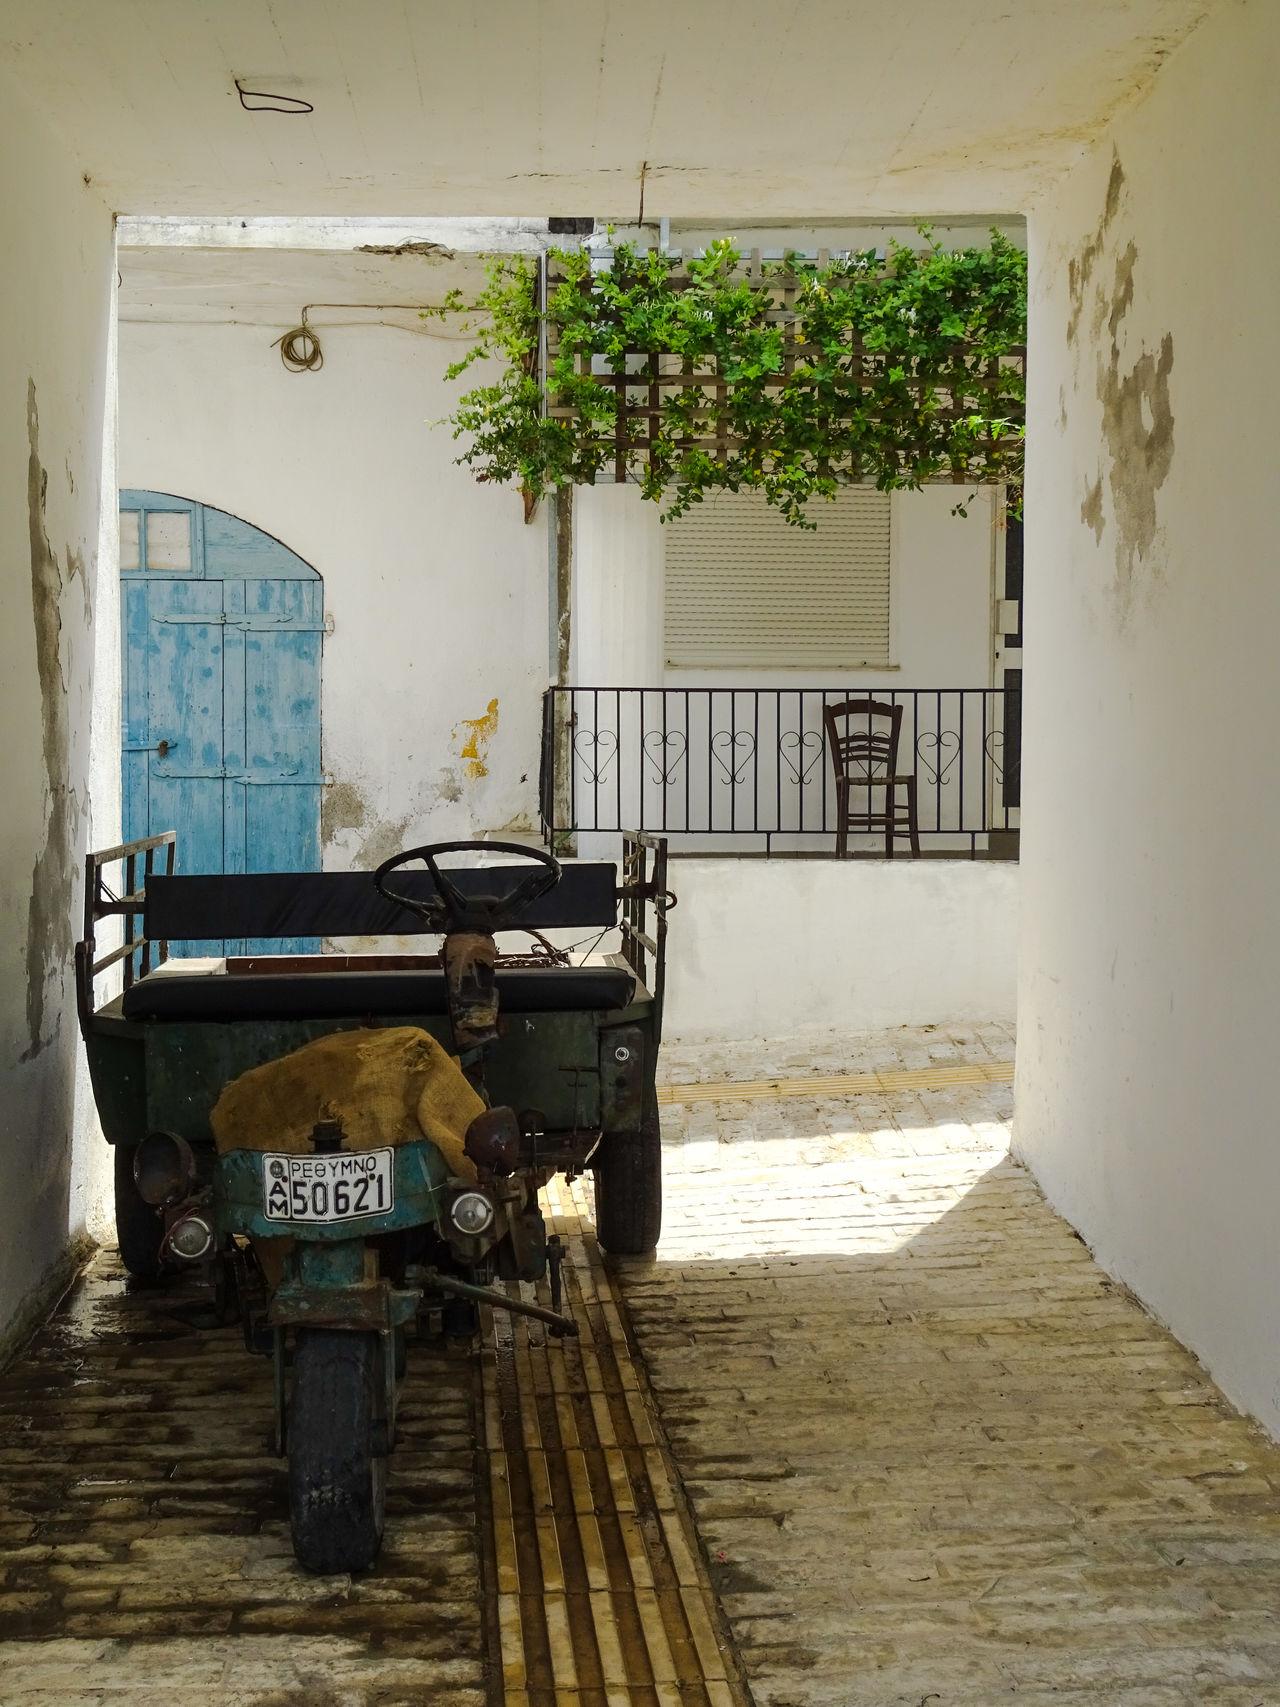 Alley Crete Greece Greek June 2016 Kreta Local No People Old Transport Transportation Travel